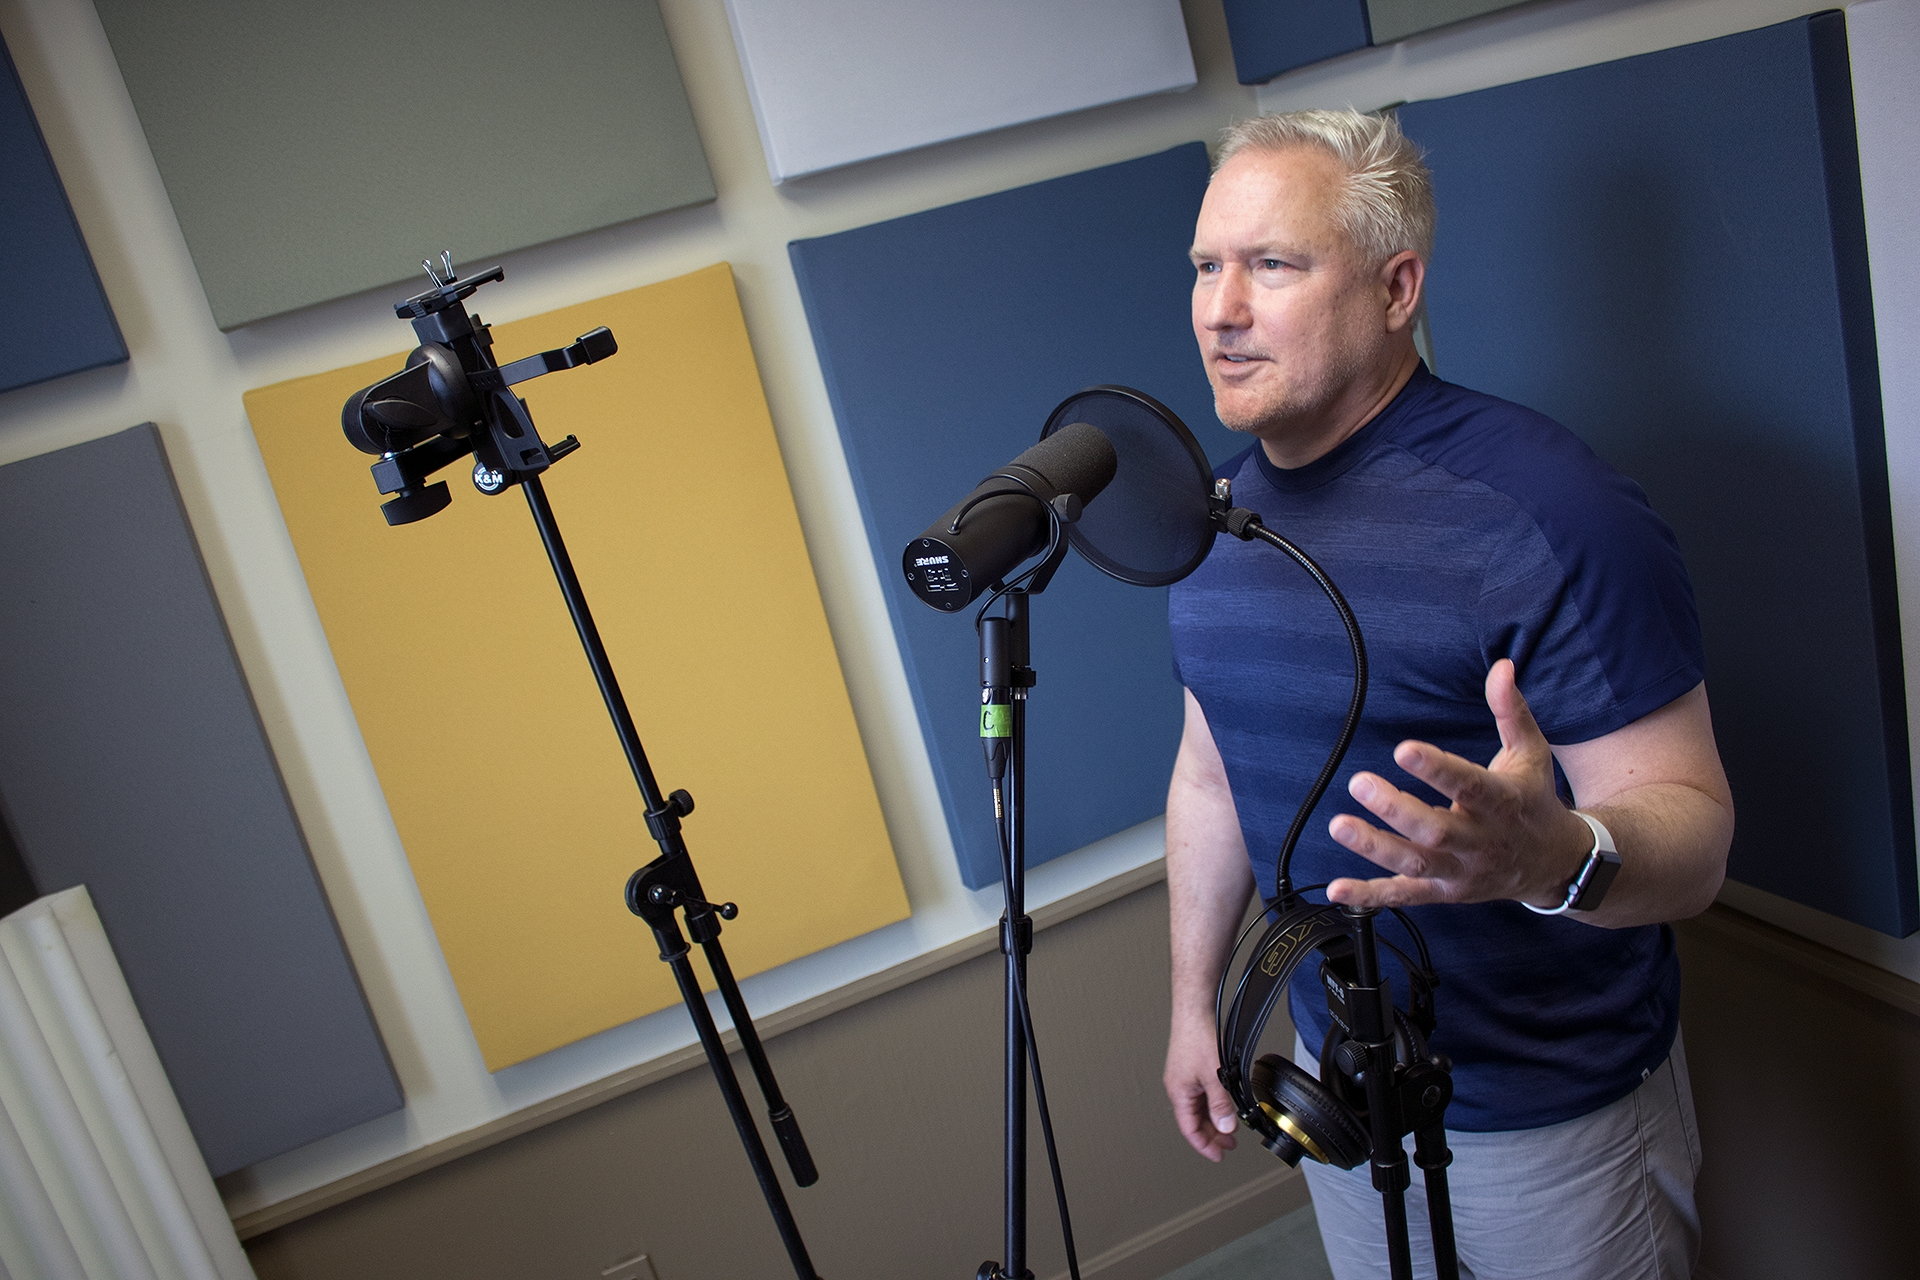 <p><em>Big Audacious Idea host, Craig James, recording the final episode of the season in his new recording booth.</em></p>